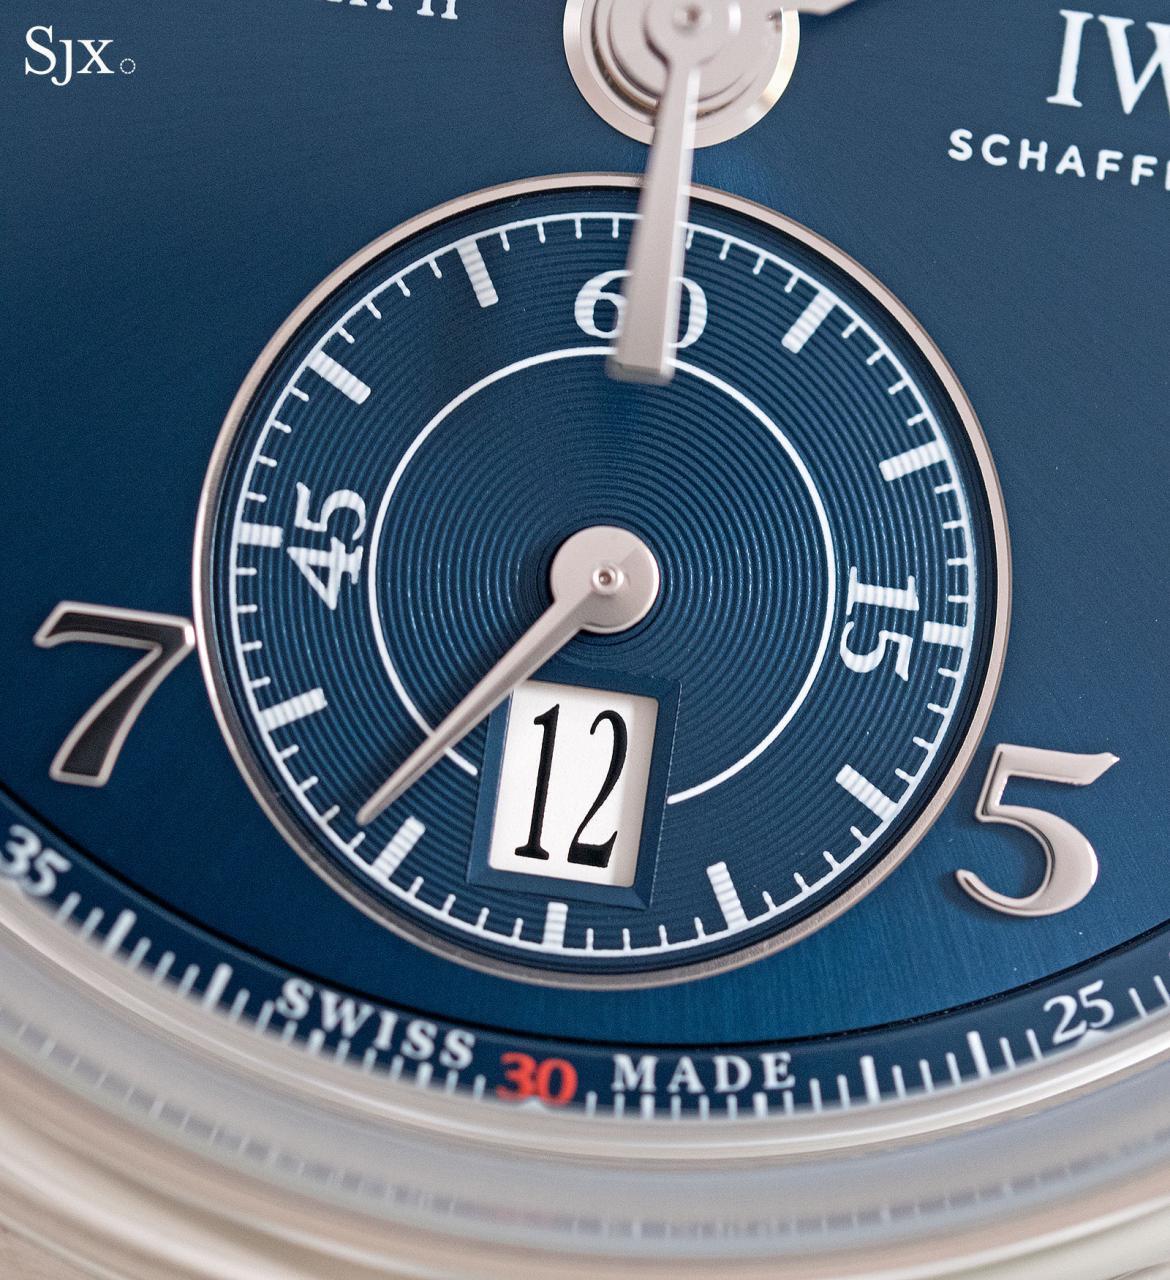 IWC Da Vinci Laureus Chronograph 6